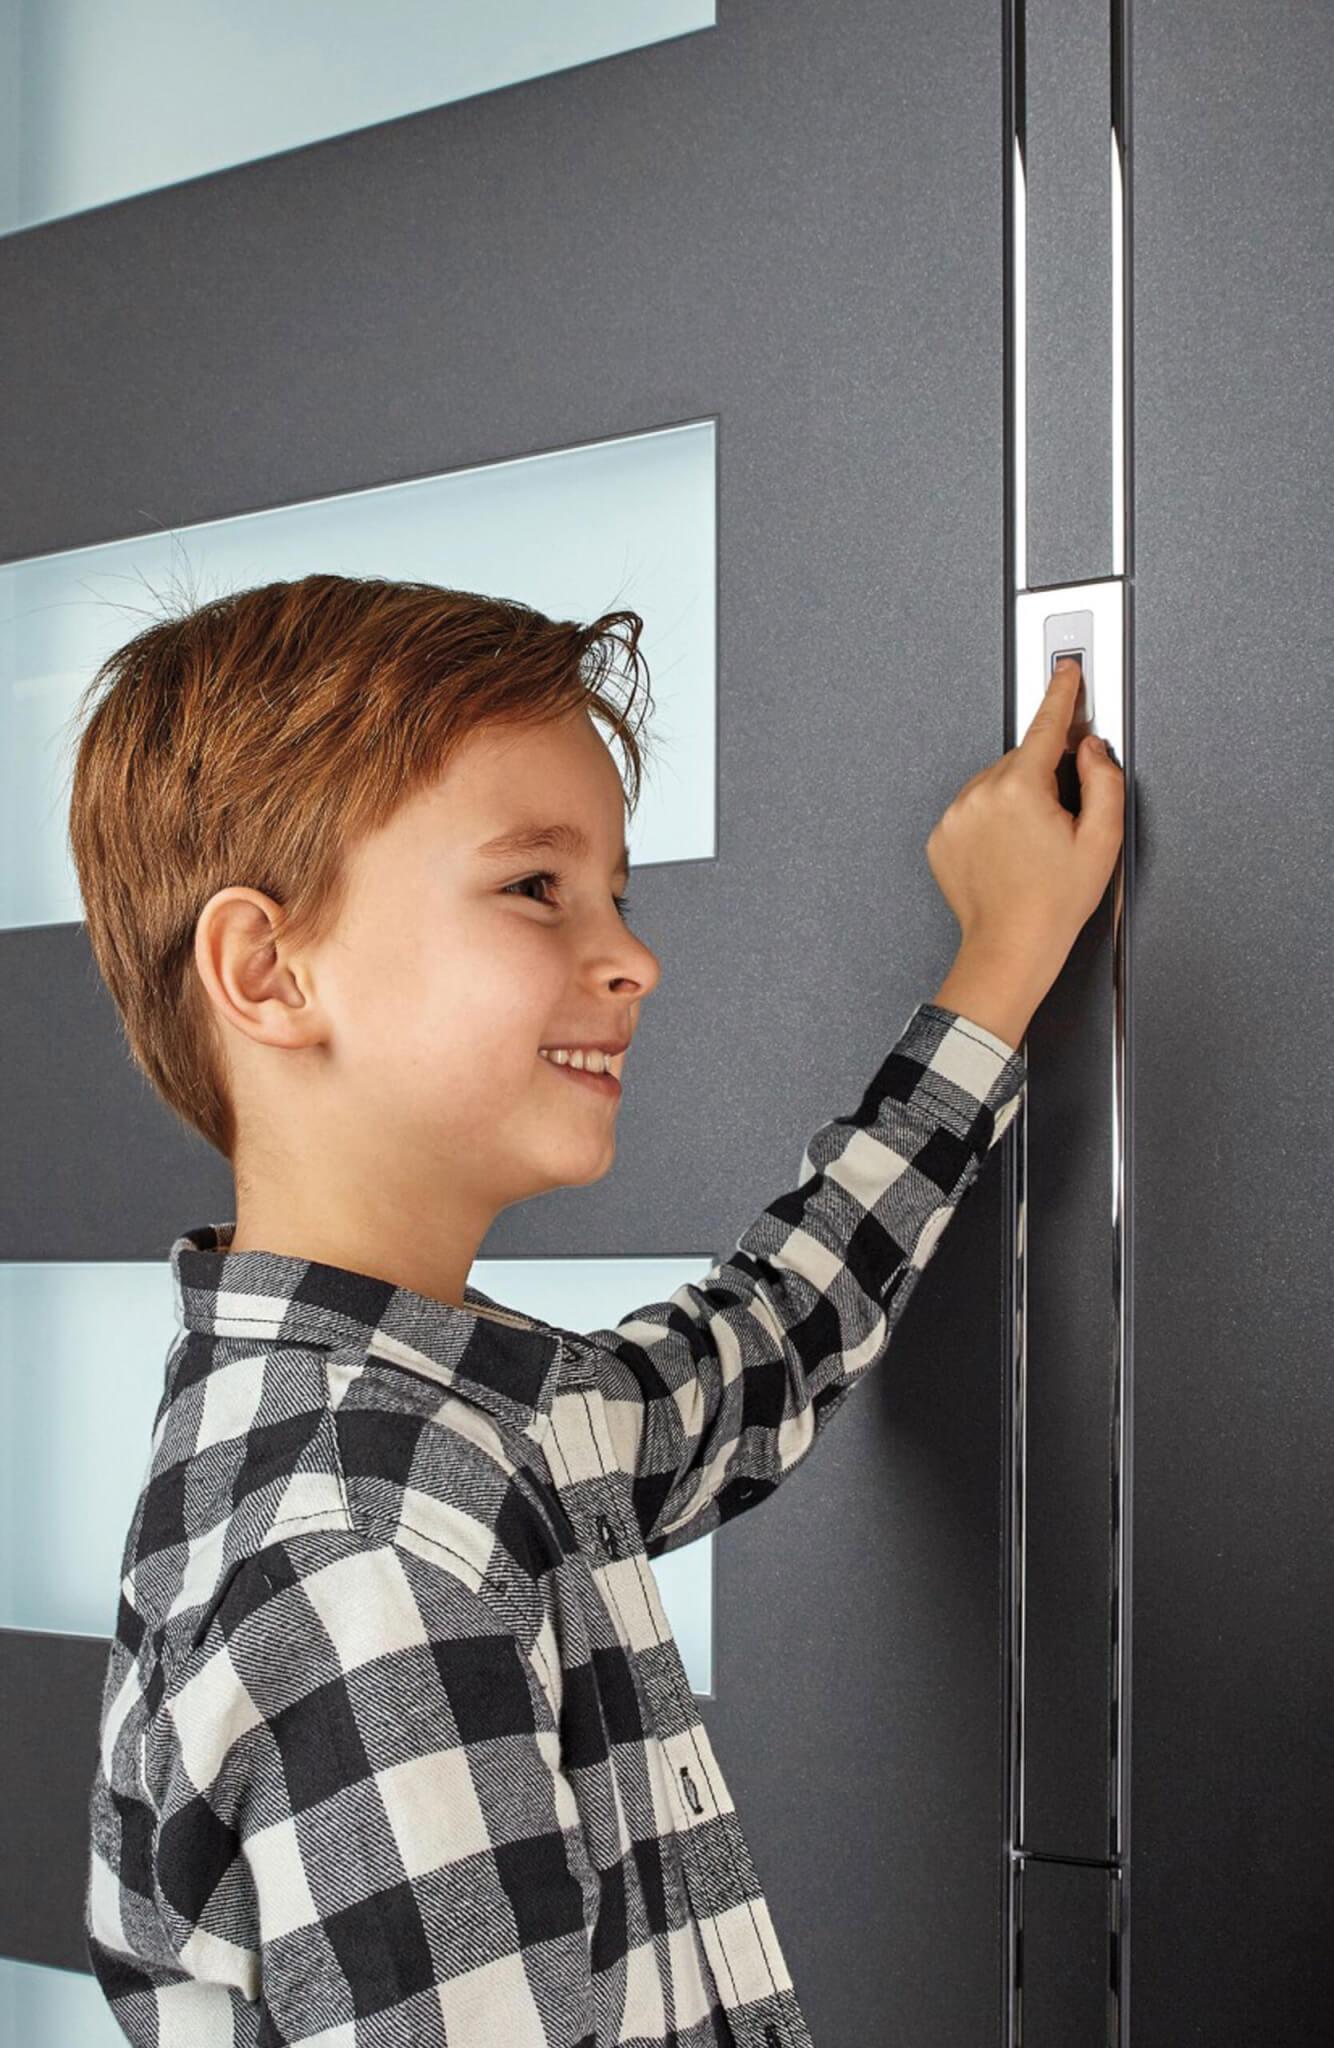 Fingerscan an Haustüre bedient durch Junge